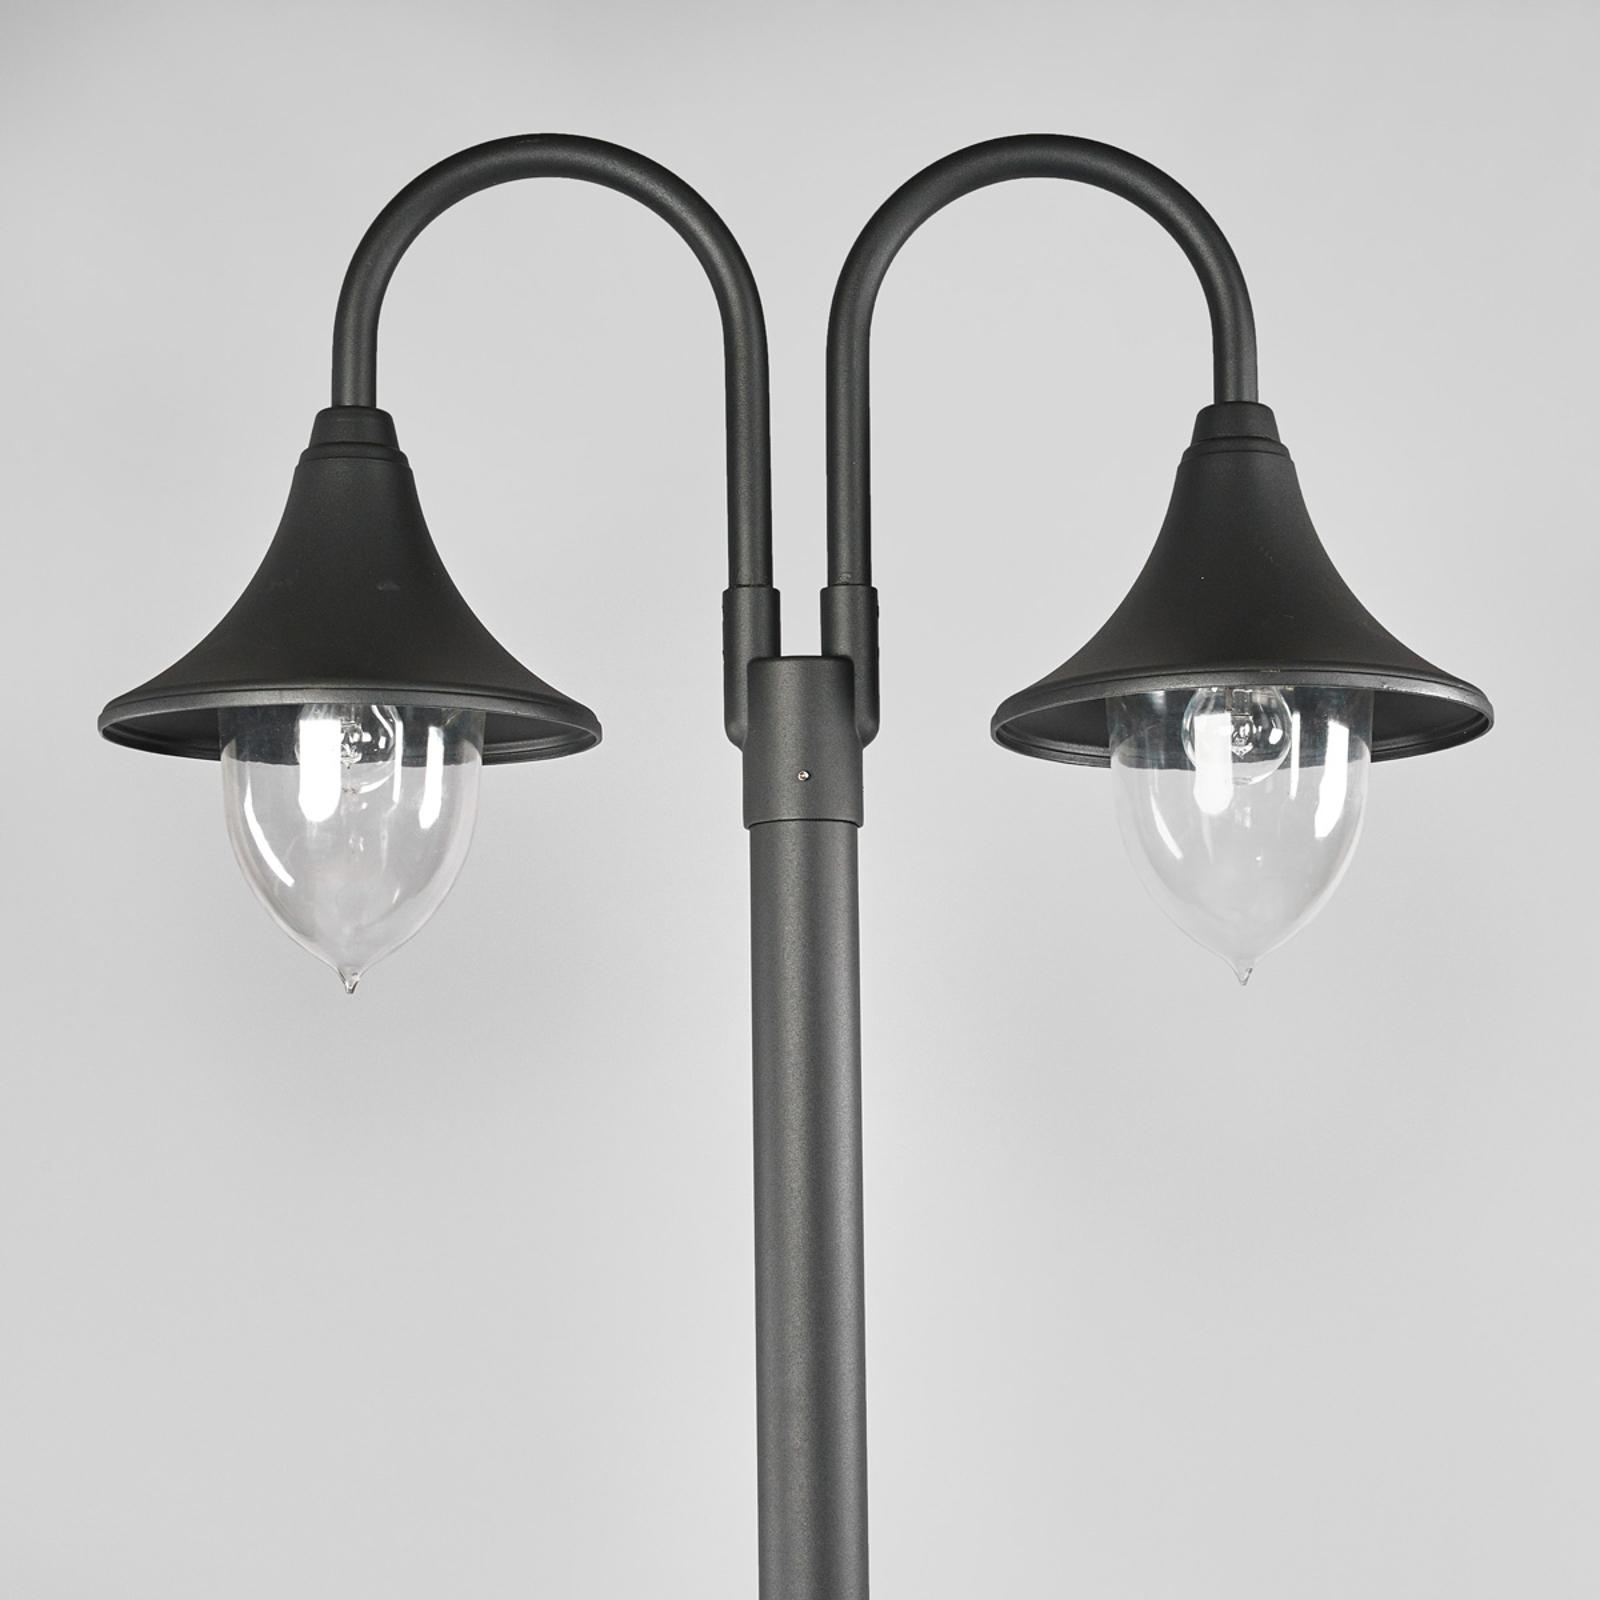 Madea - kandelaber med to lys